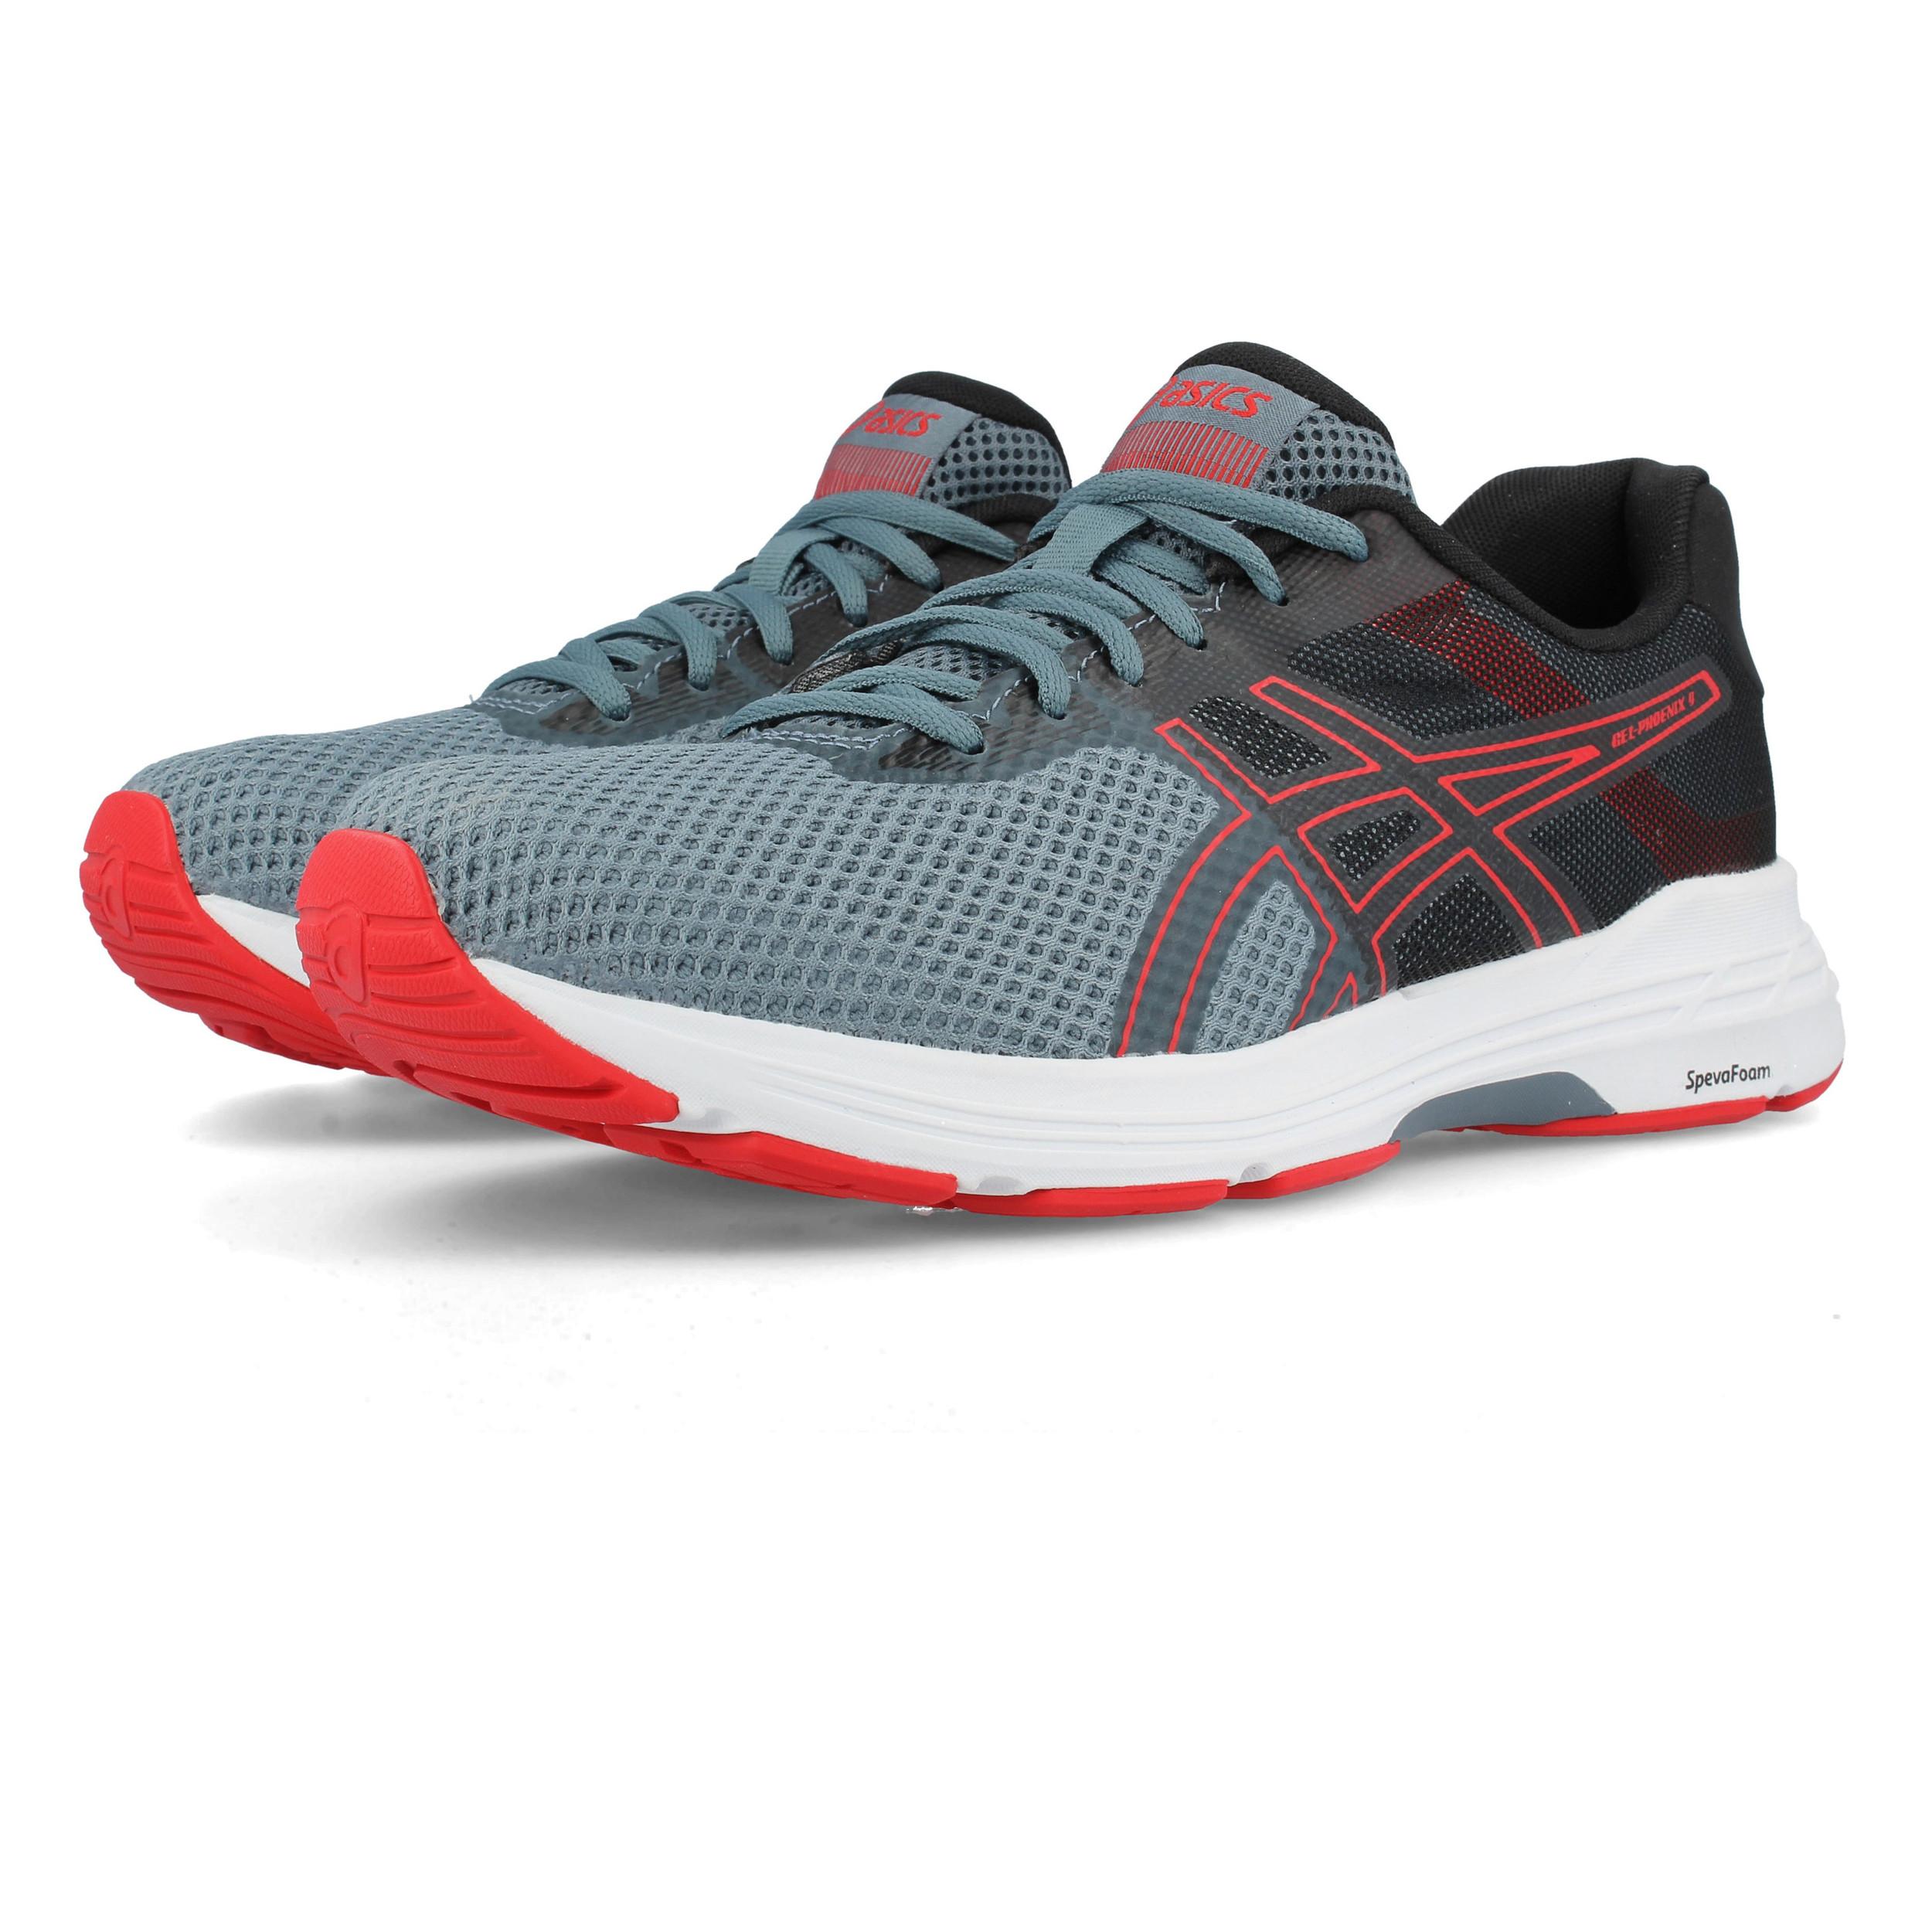 Transpirable Correr Hombre Gel Asics 9 Zapatillas Deporte Zapatos Detalles De Azul Phoenix J3uFKclT1